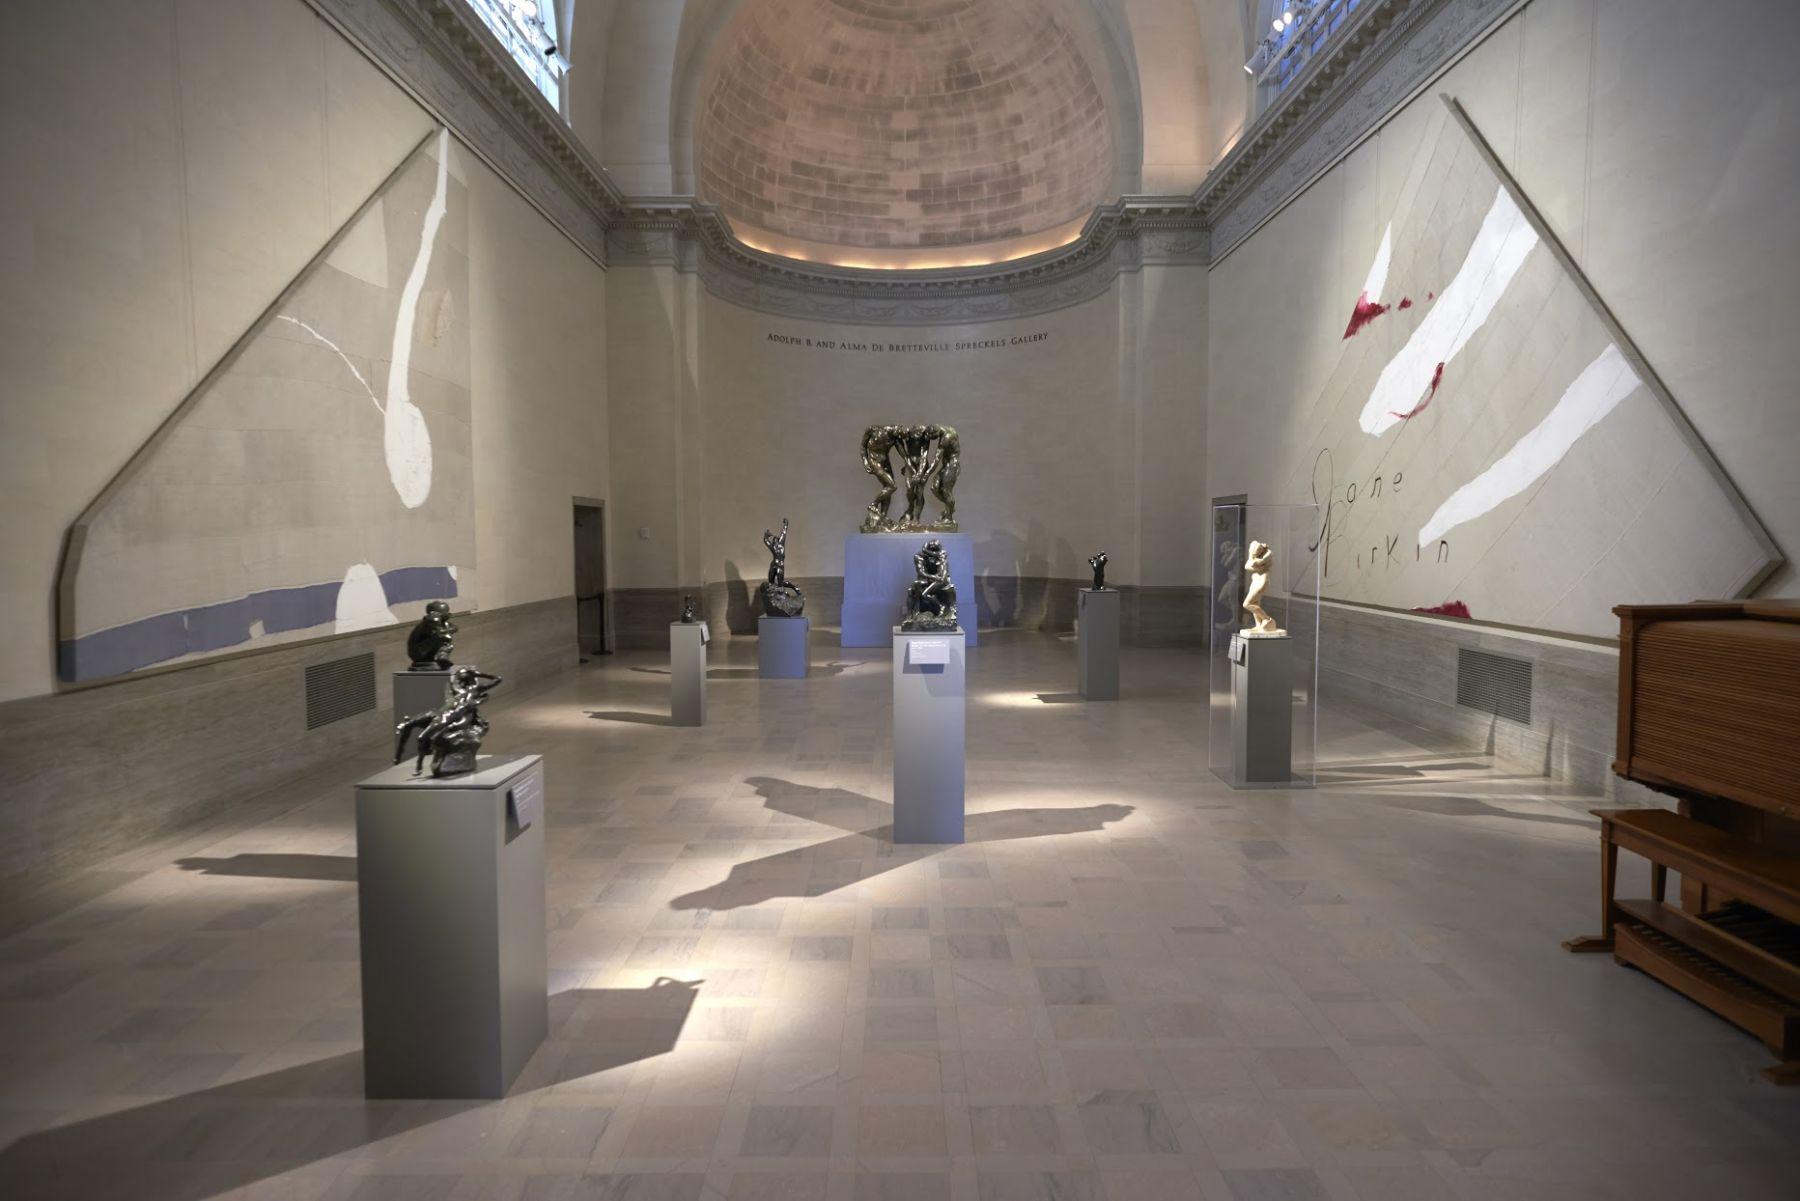 Installation view,Julian Schnabel: Symbols of Actual Life, Legion of Honor, San Francisco, 2018